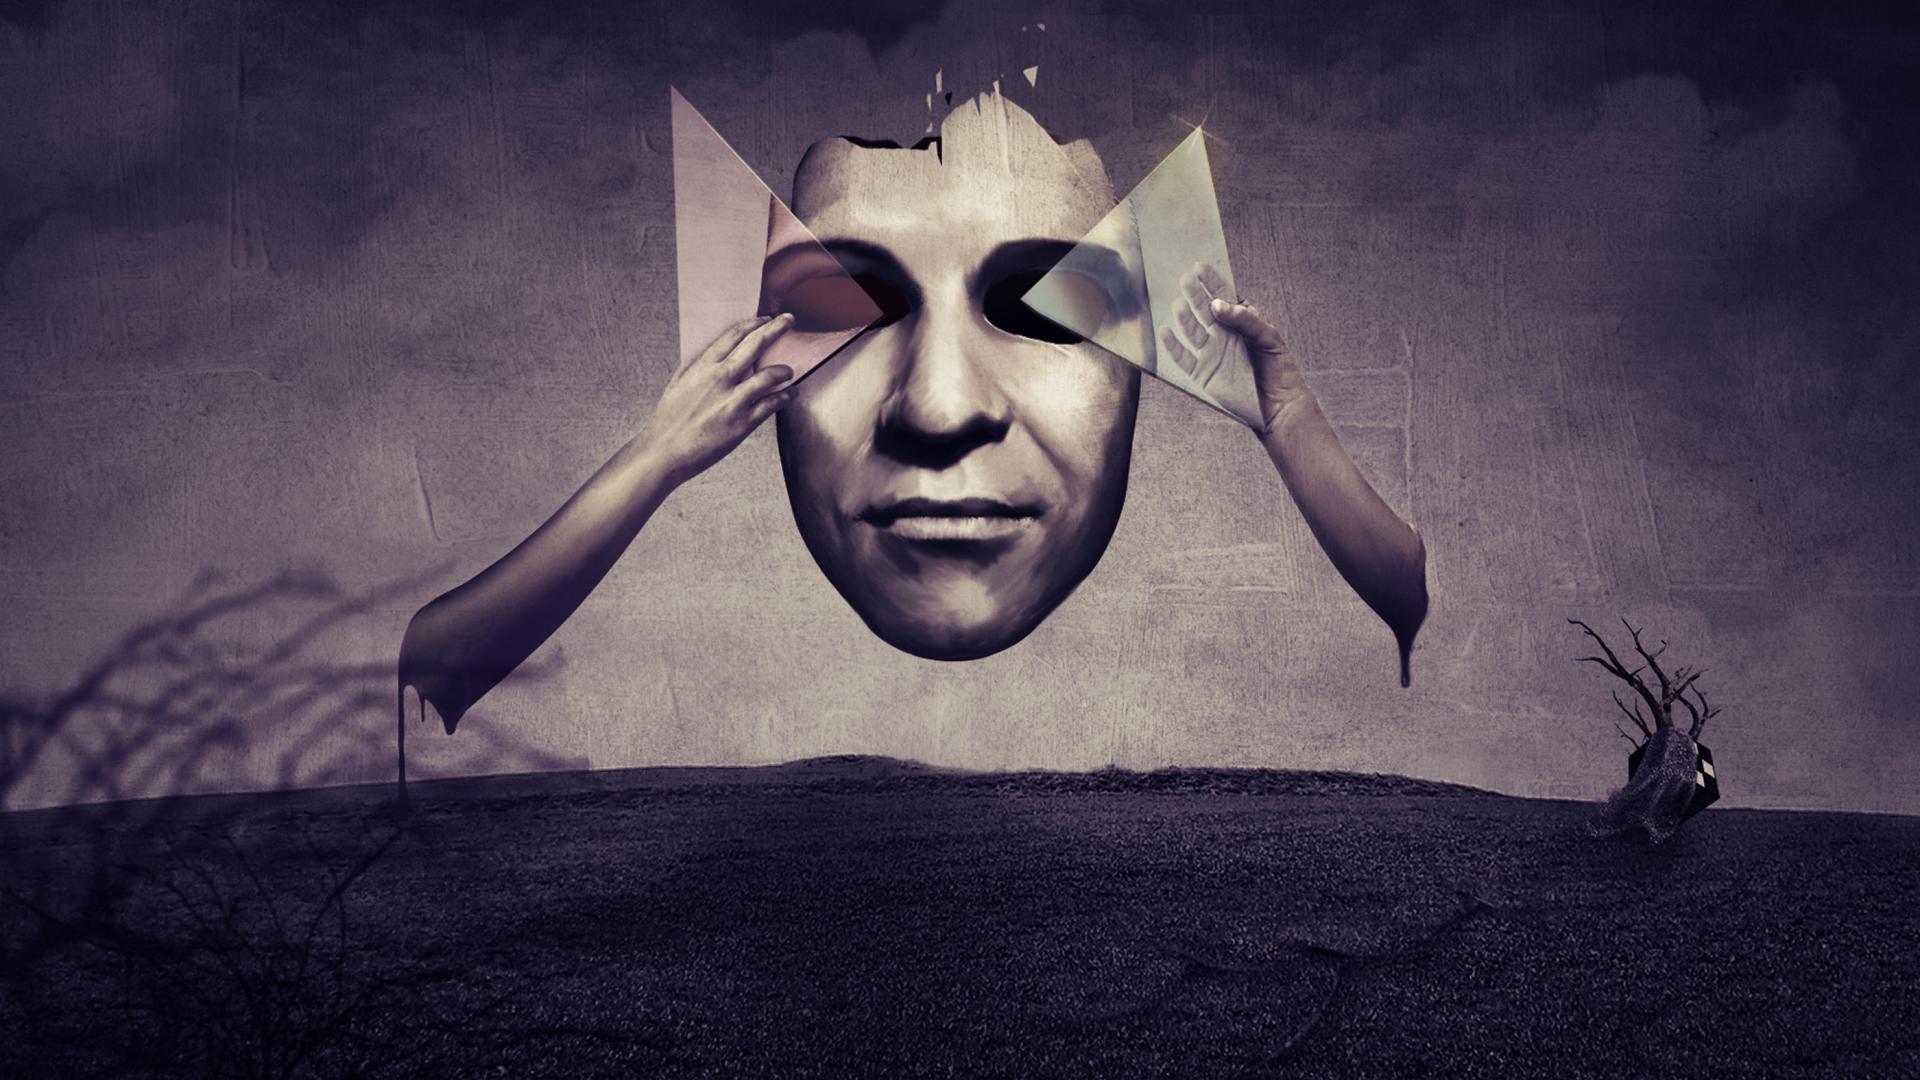 surrealism-artwork-faces-surreal-art-1920x1080-57025